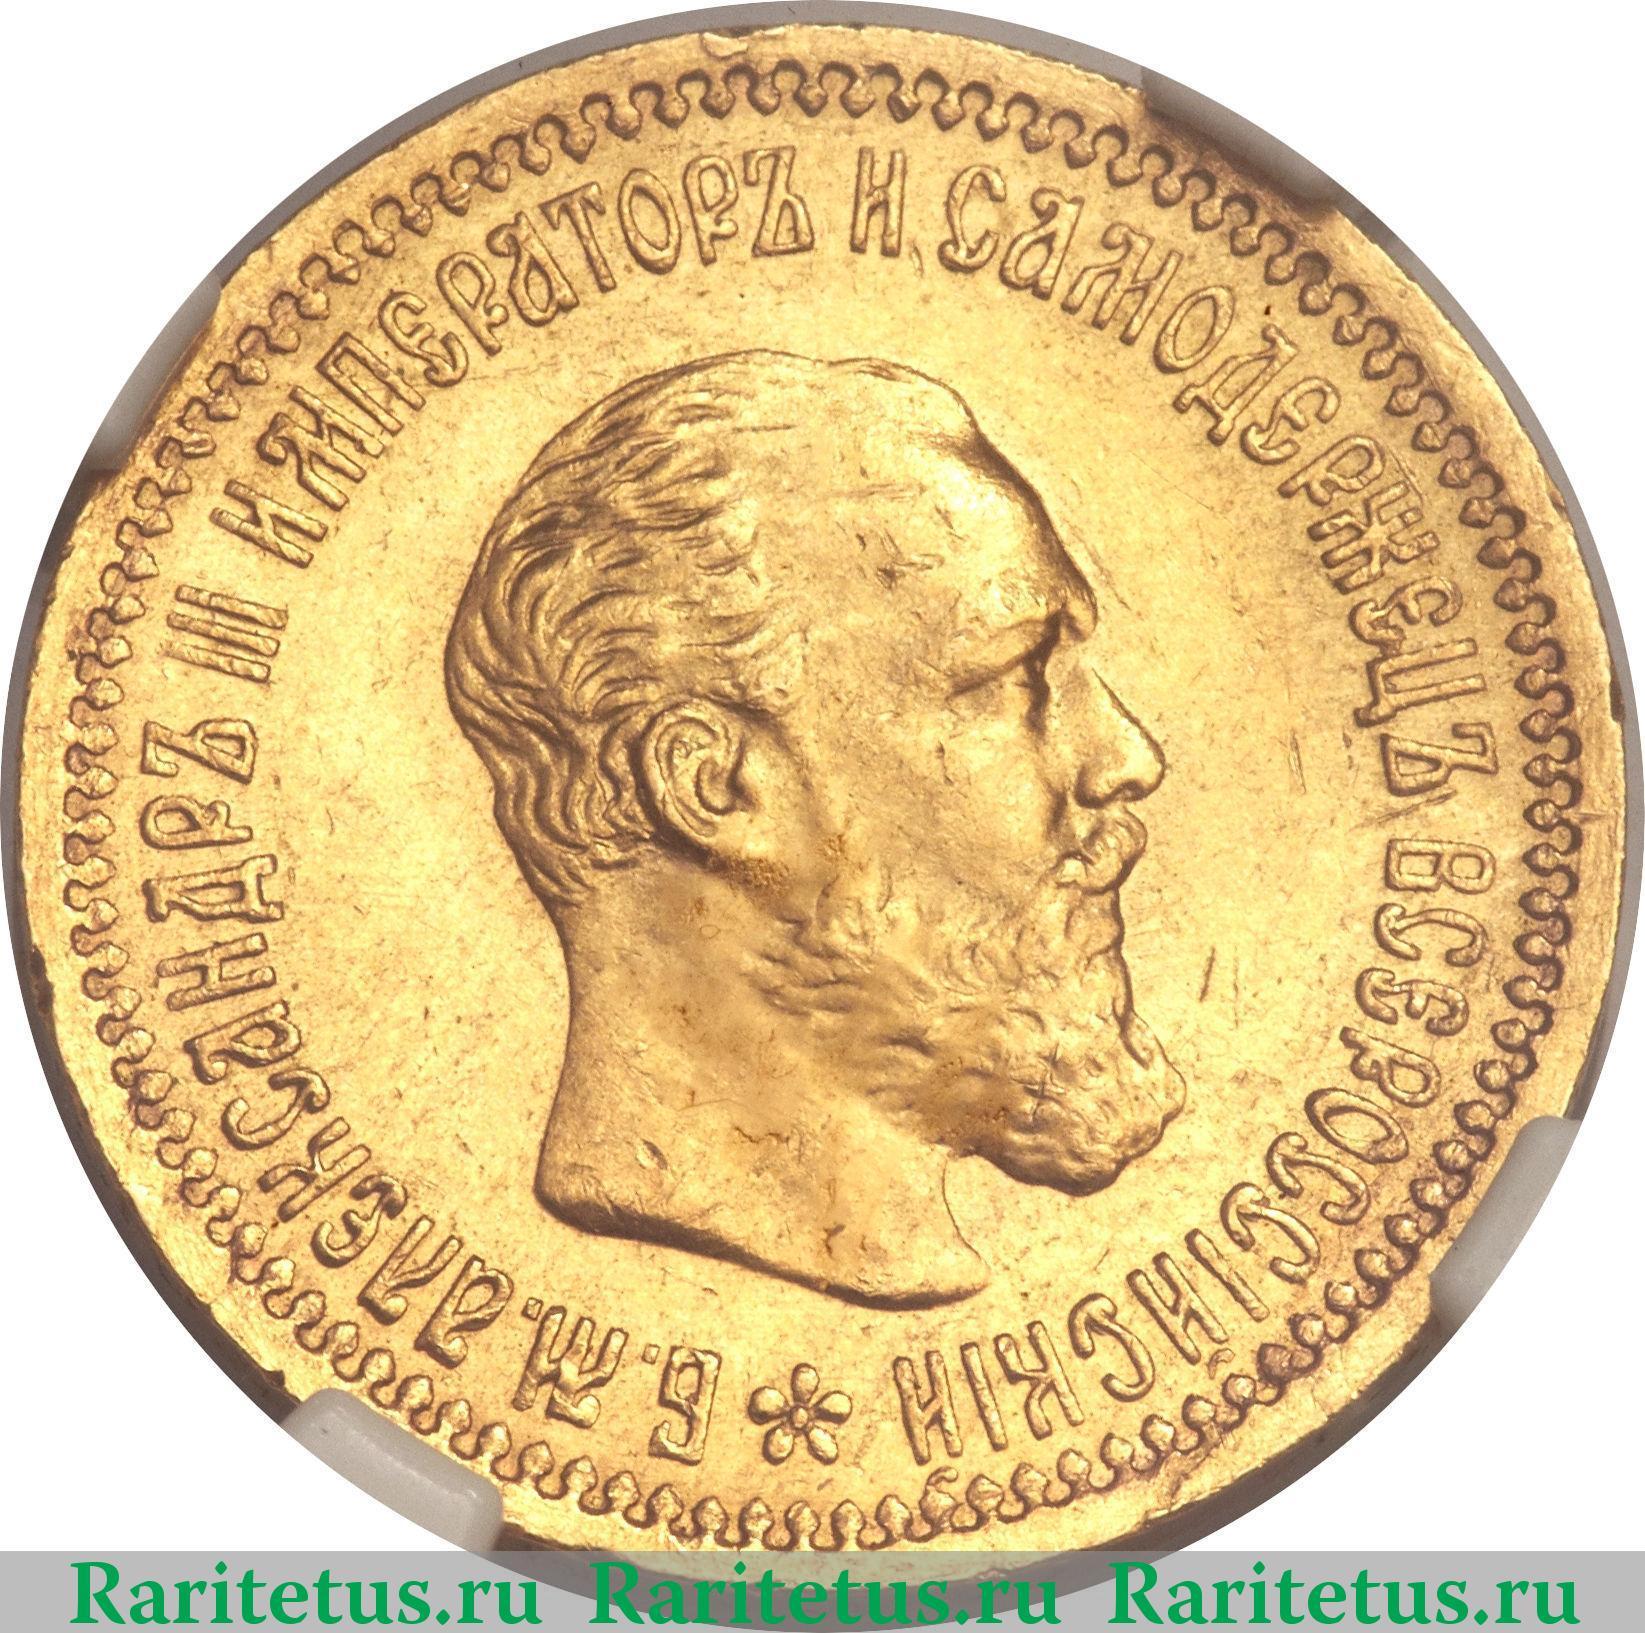 Монеты аг эрик герцог вестманландский